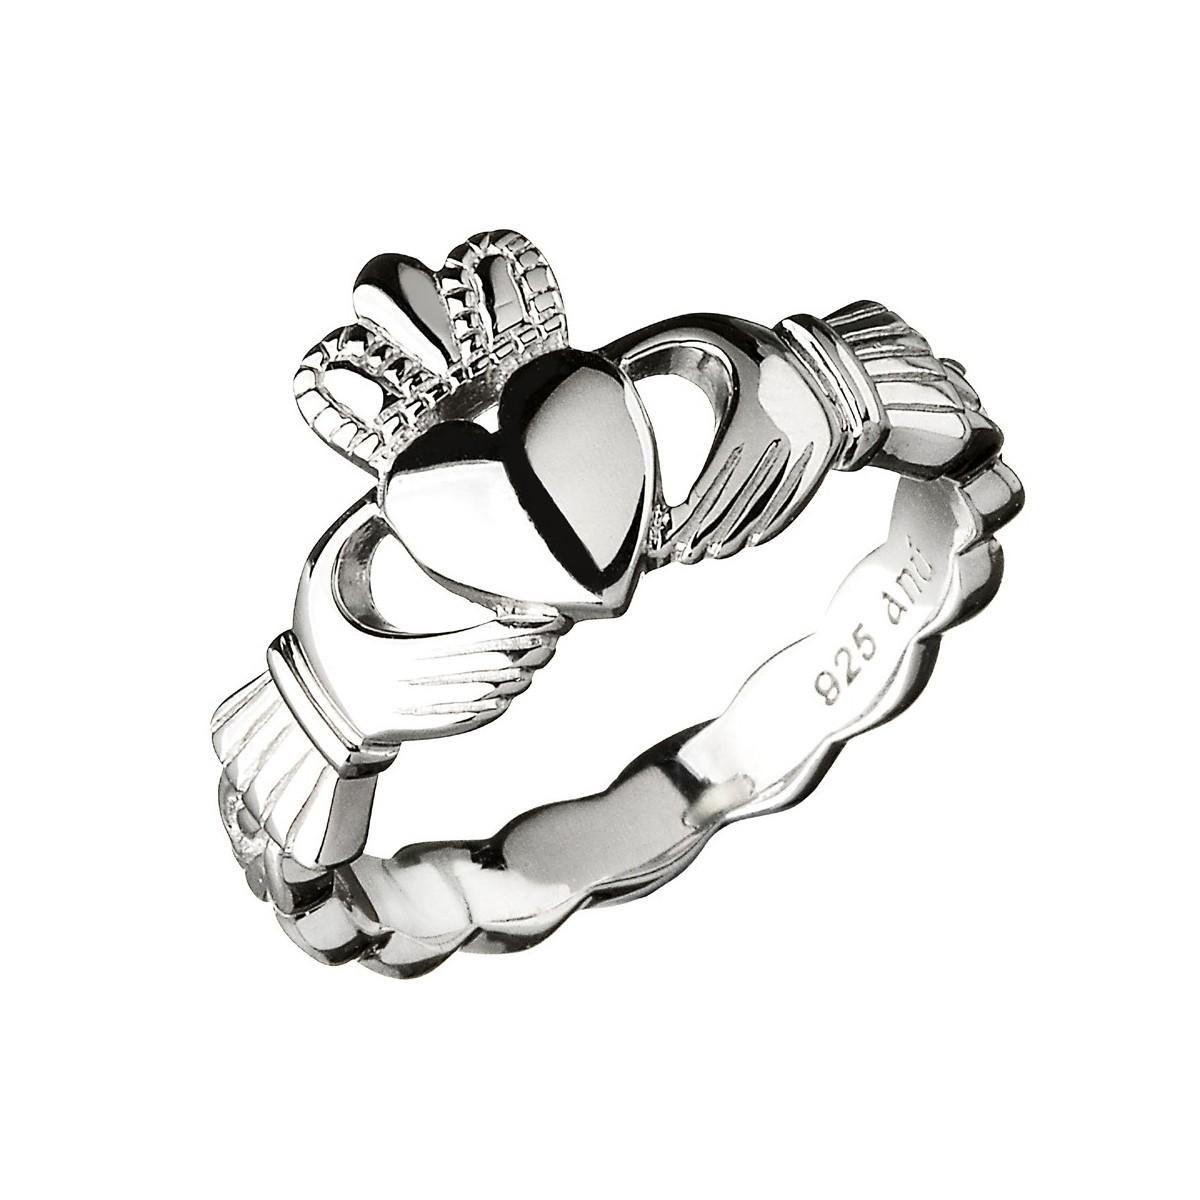 1200x1200 Claddagh Ring With A Twist Band Claddagh Jewellers